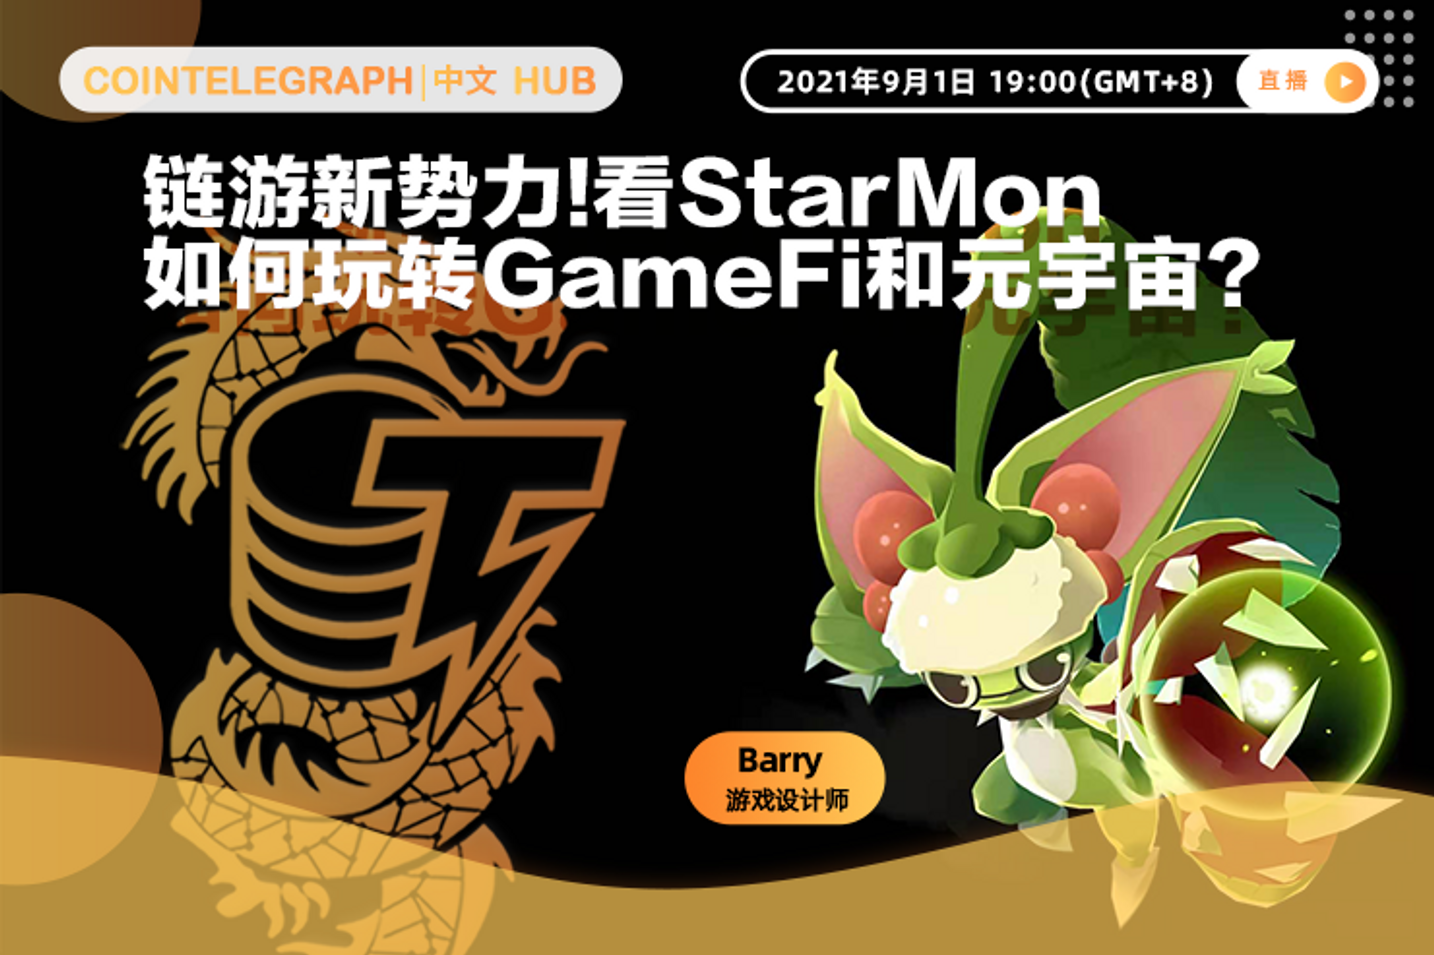 Cointelegraph中文HUB | 链游新势力!看StarMon如何玩转GameFi和元宇宙?